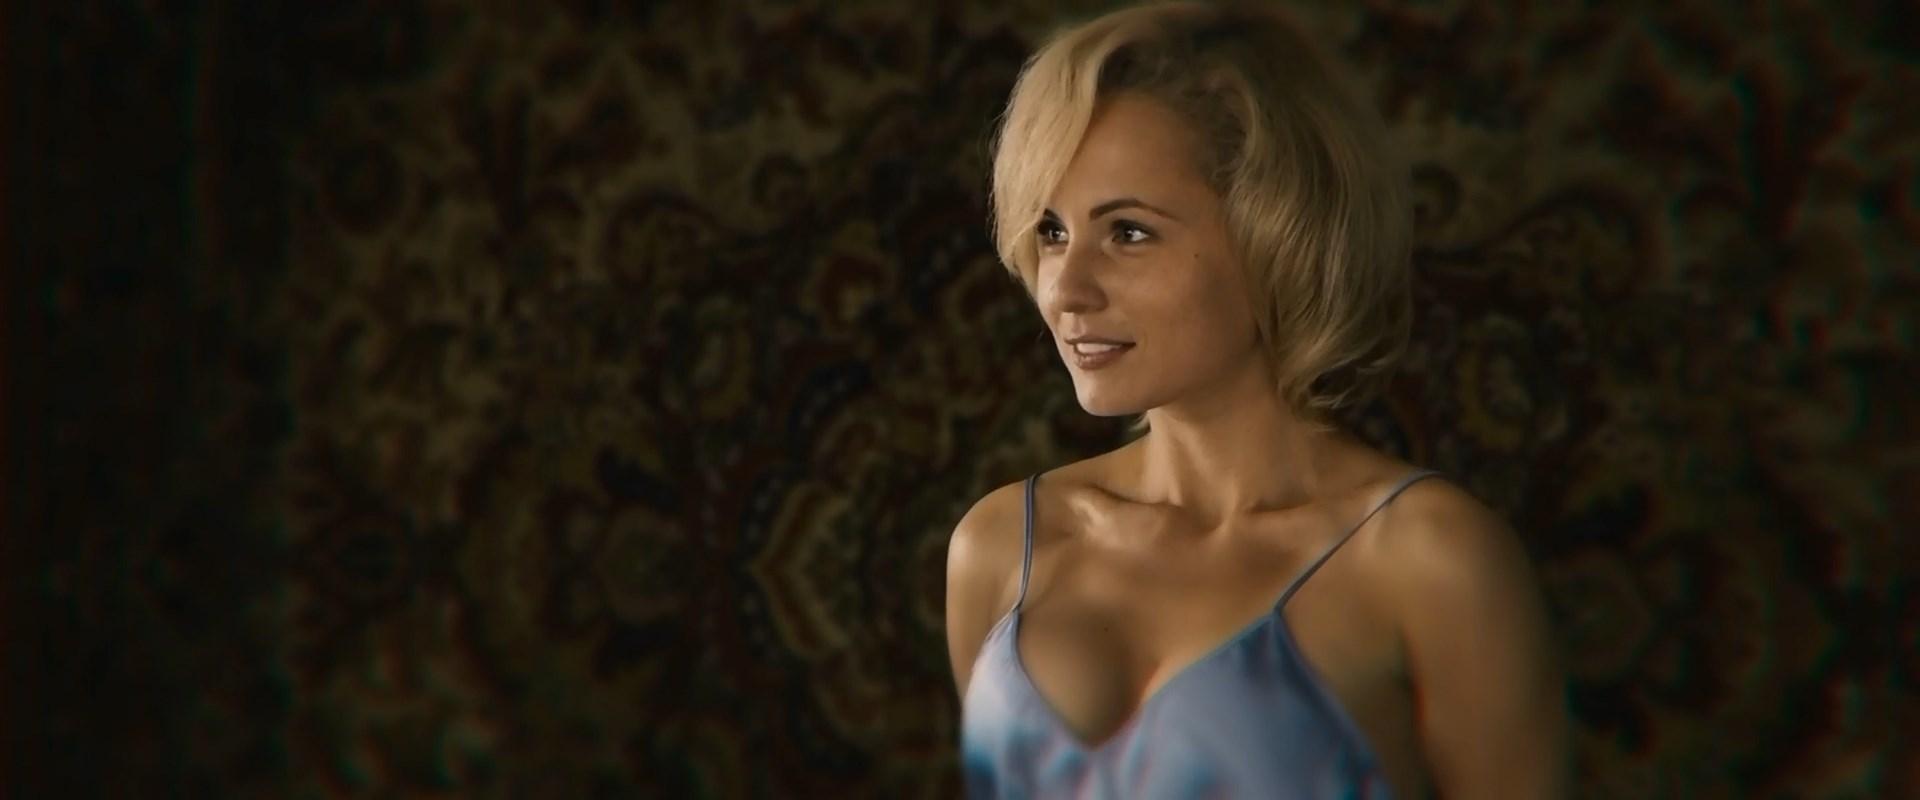 Angela Sarafyan Tits watch online - elvira bolgova - igra (2018) hd 1080p